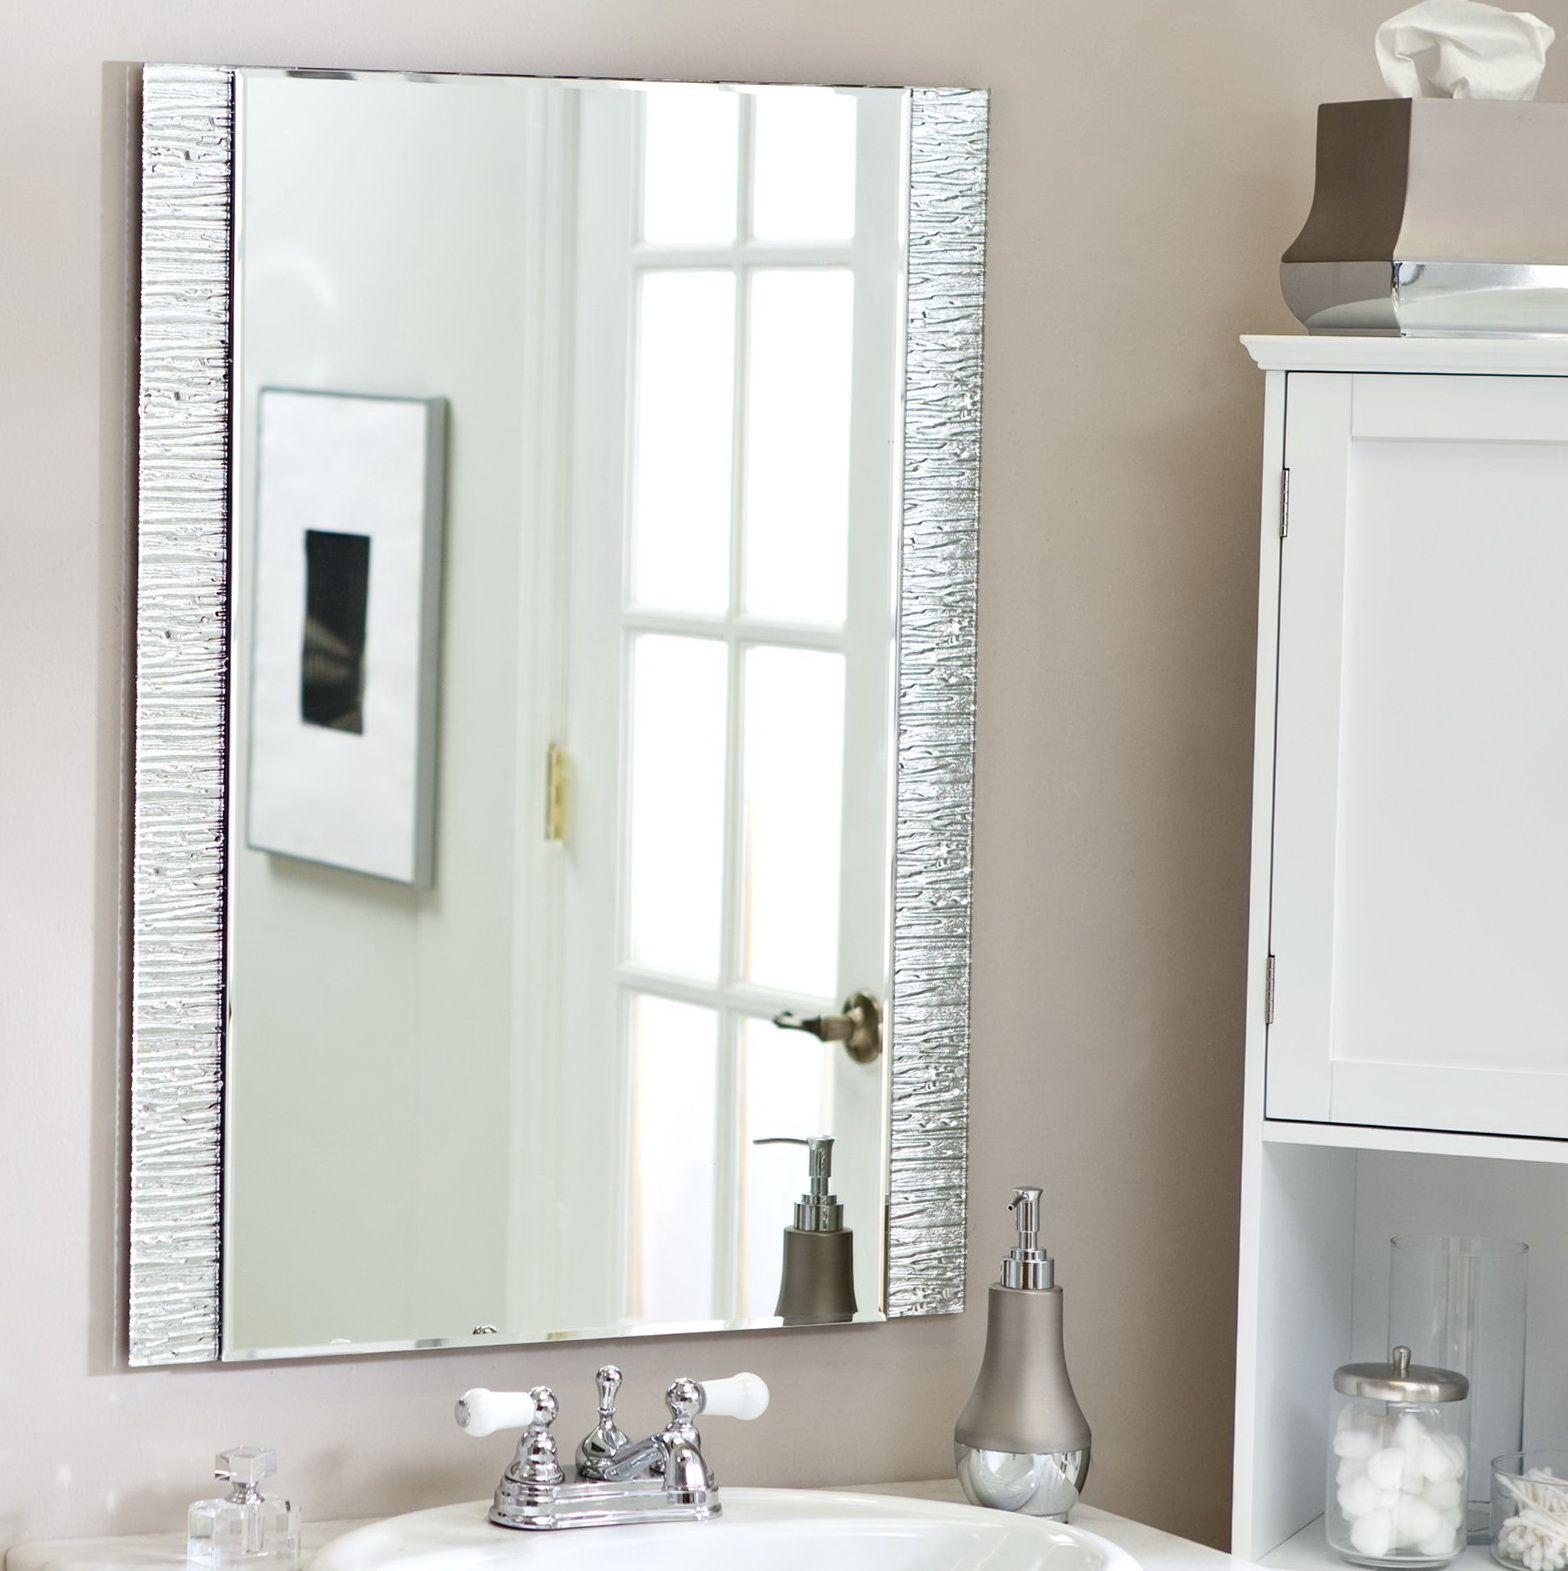 25 Best Bathroom Mirror Ideas For a Small Bathroom